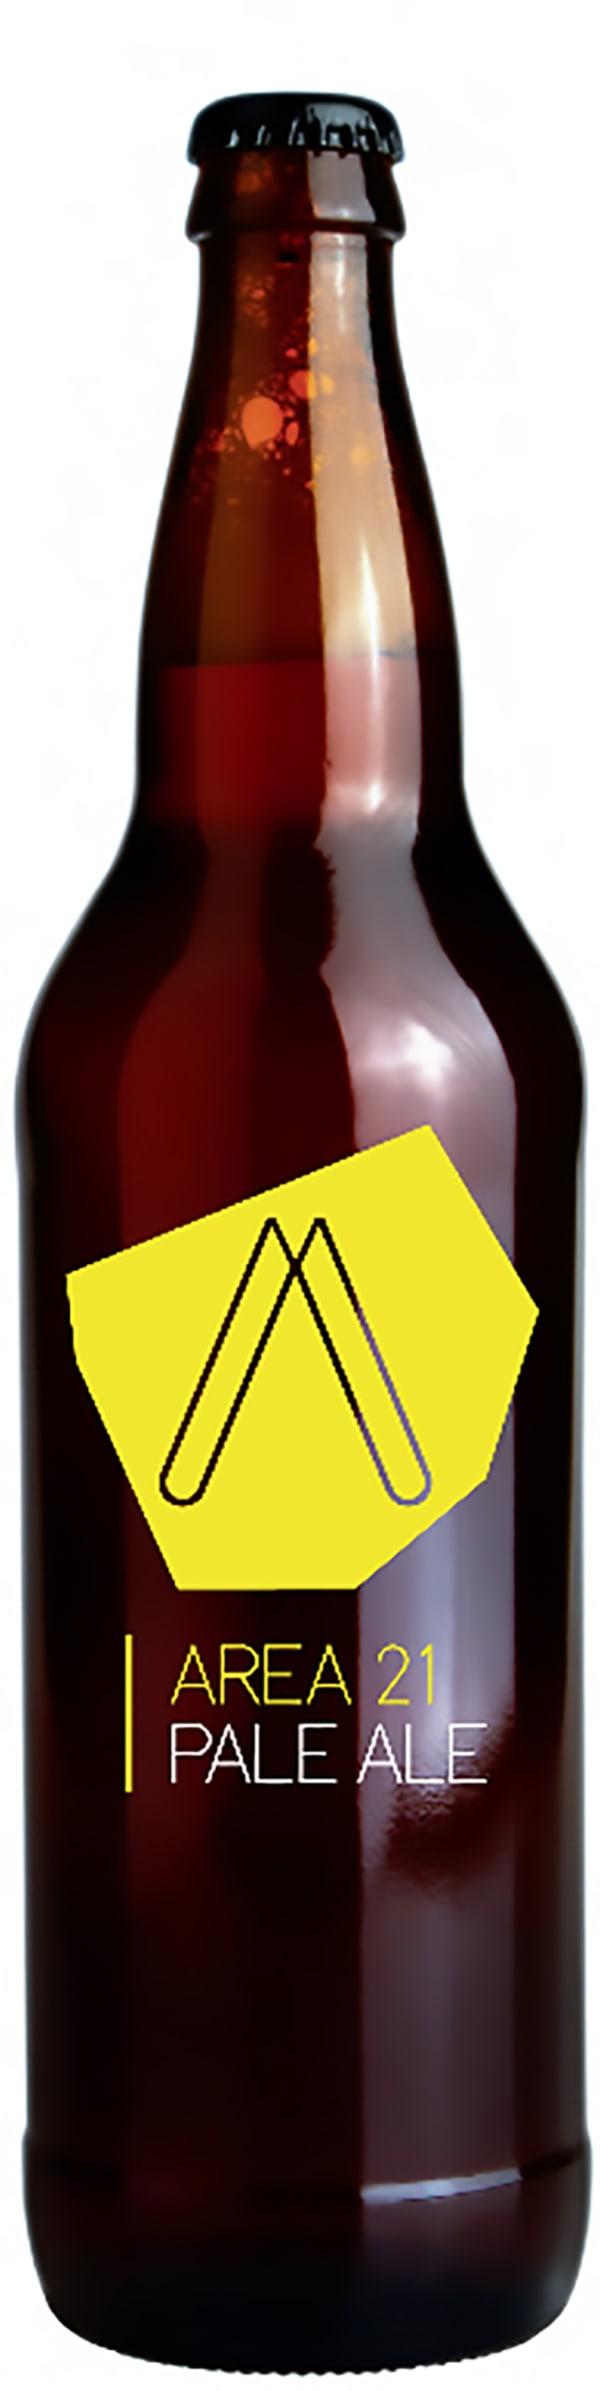 Olarin Area 21 Pale Ale